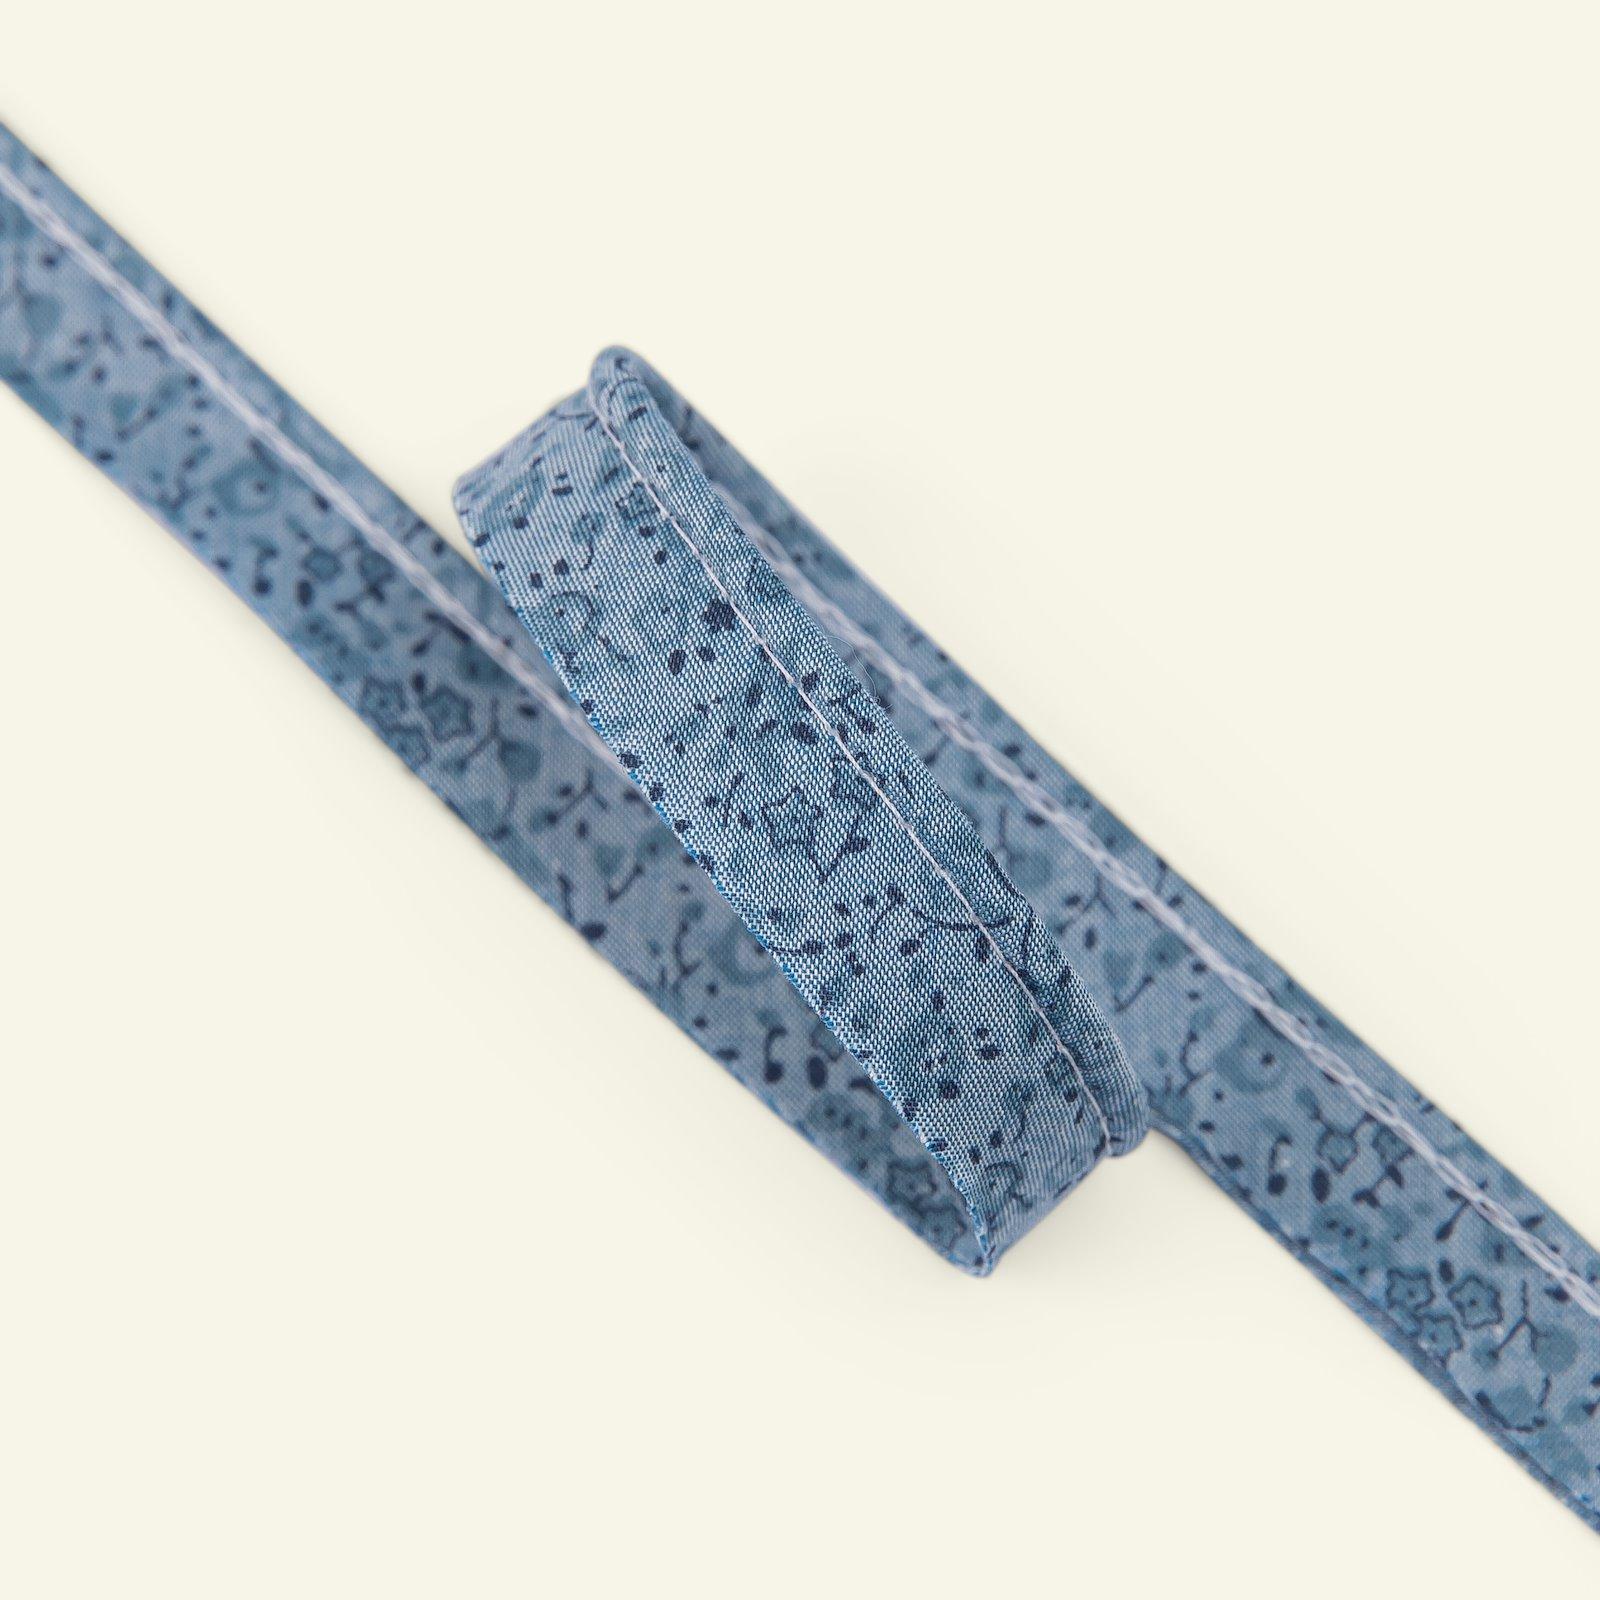 Piping flowers 4mm denim/blue 3m 22341_pack